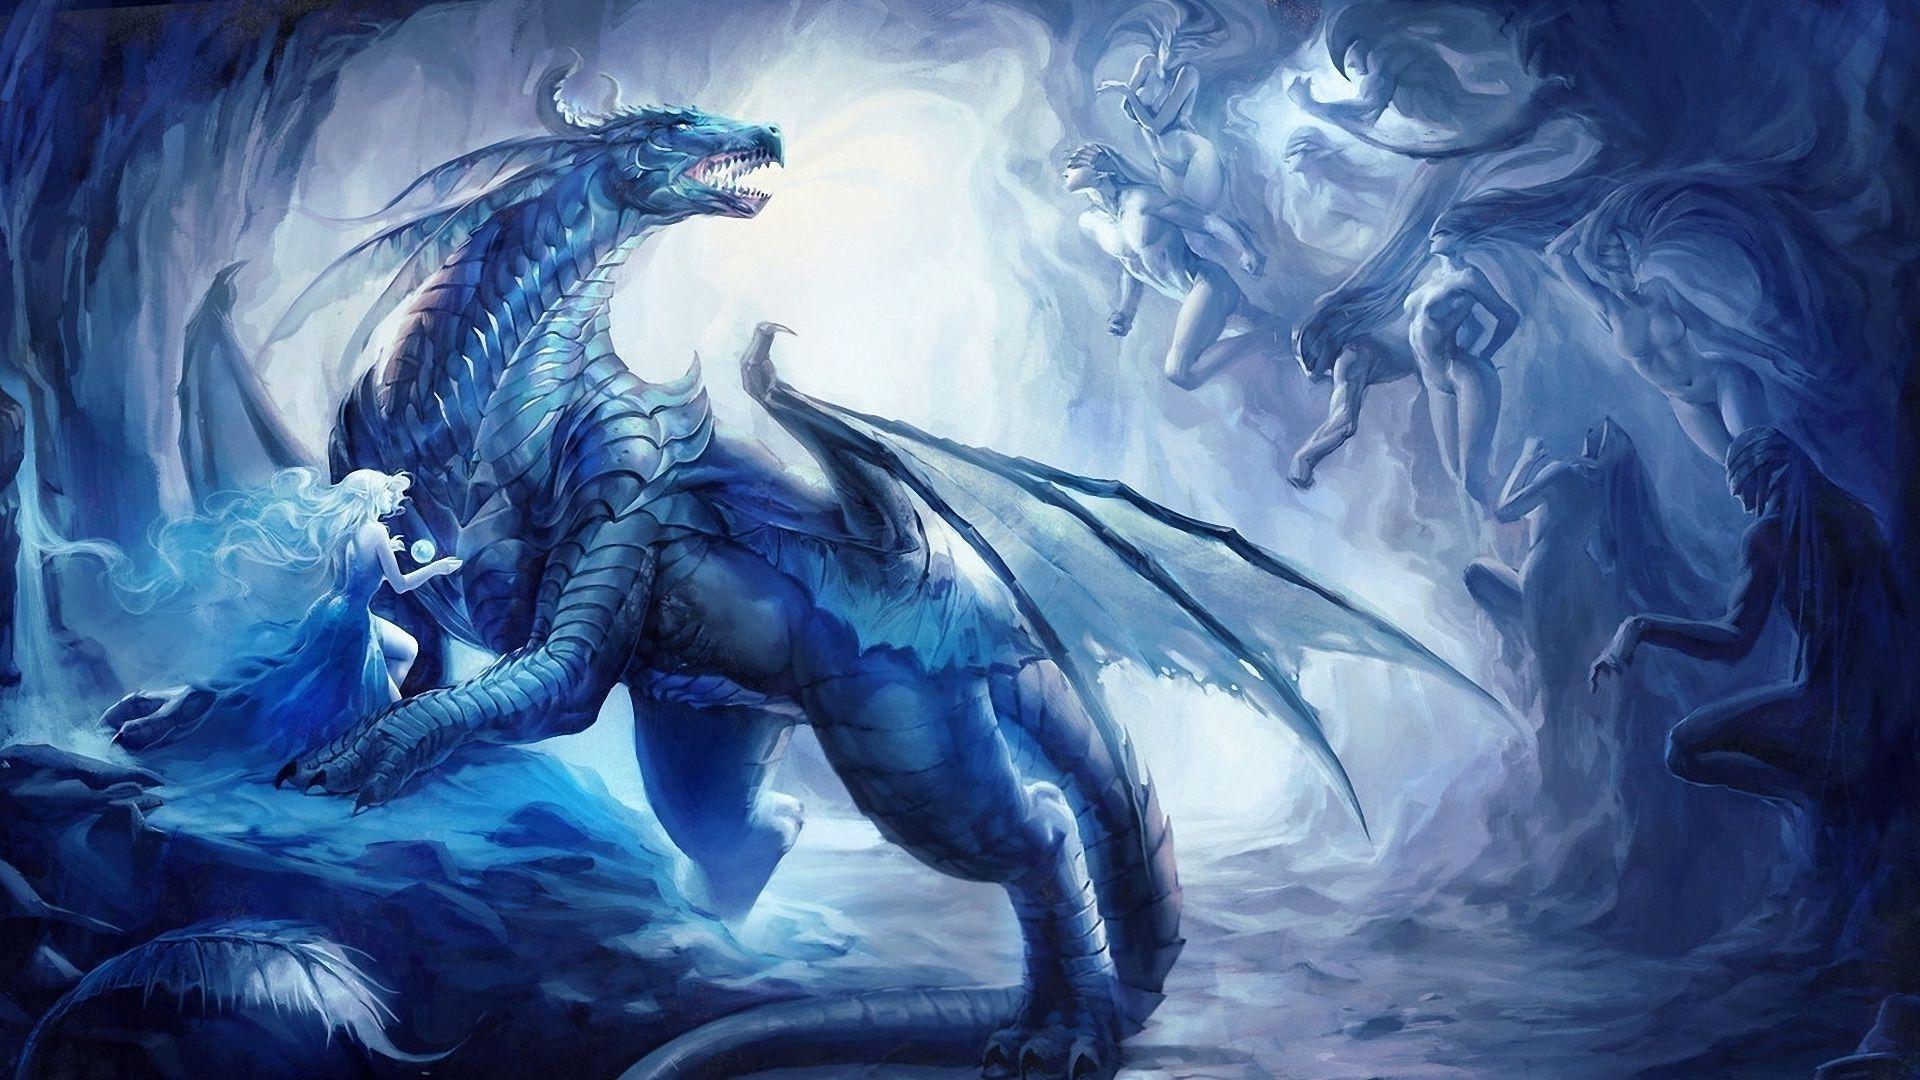 Blue Dragon Wallpaper Fantasy dragon, Dragon images